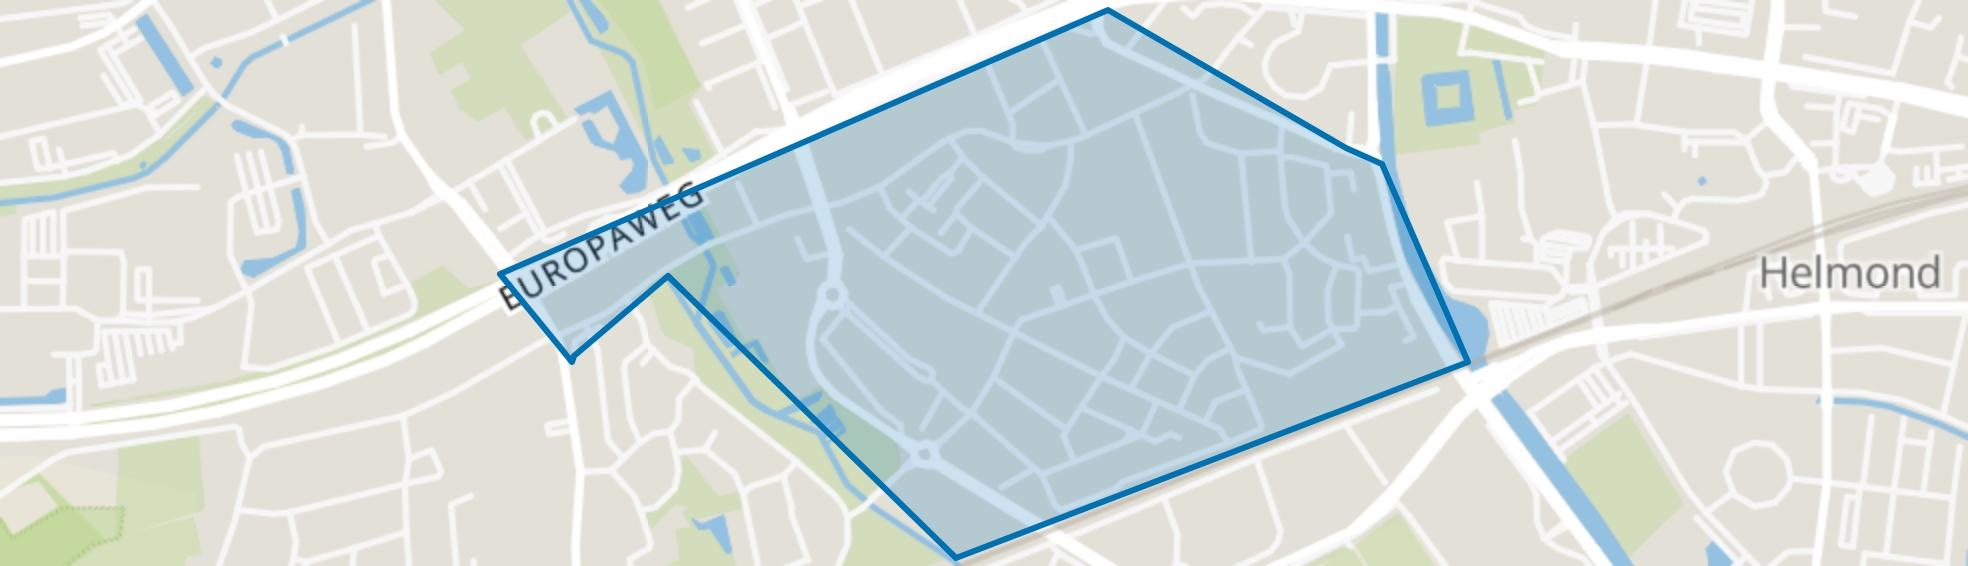 West, Helmond map